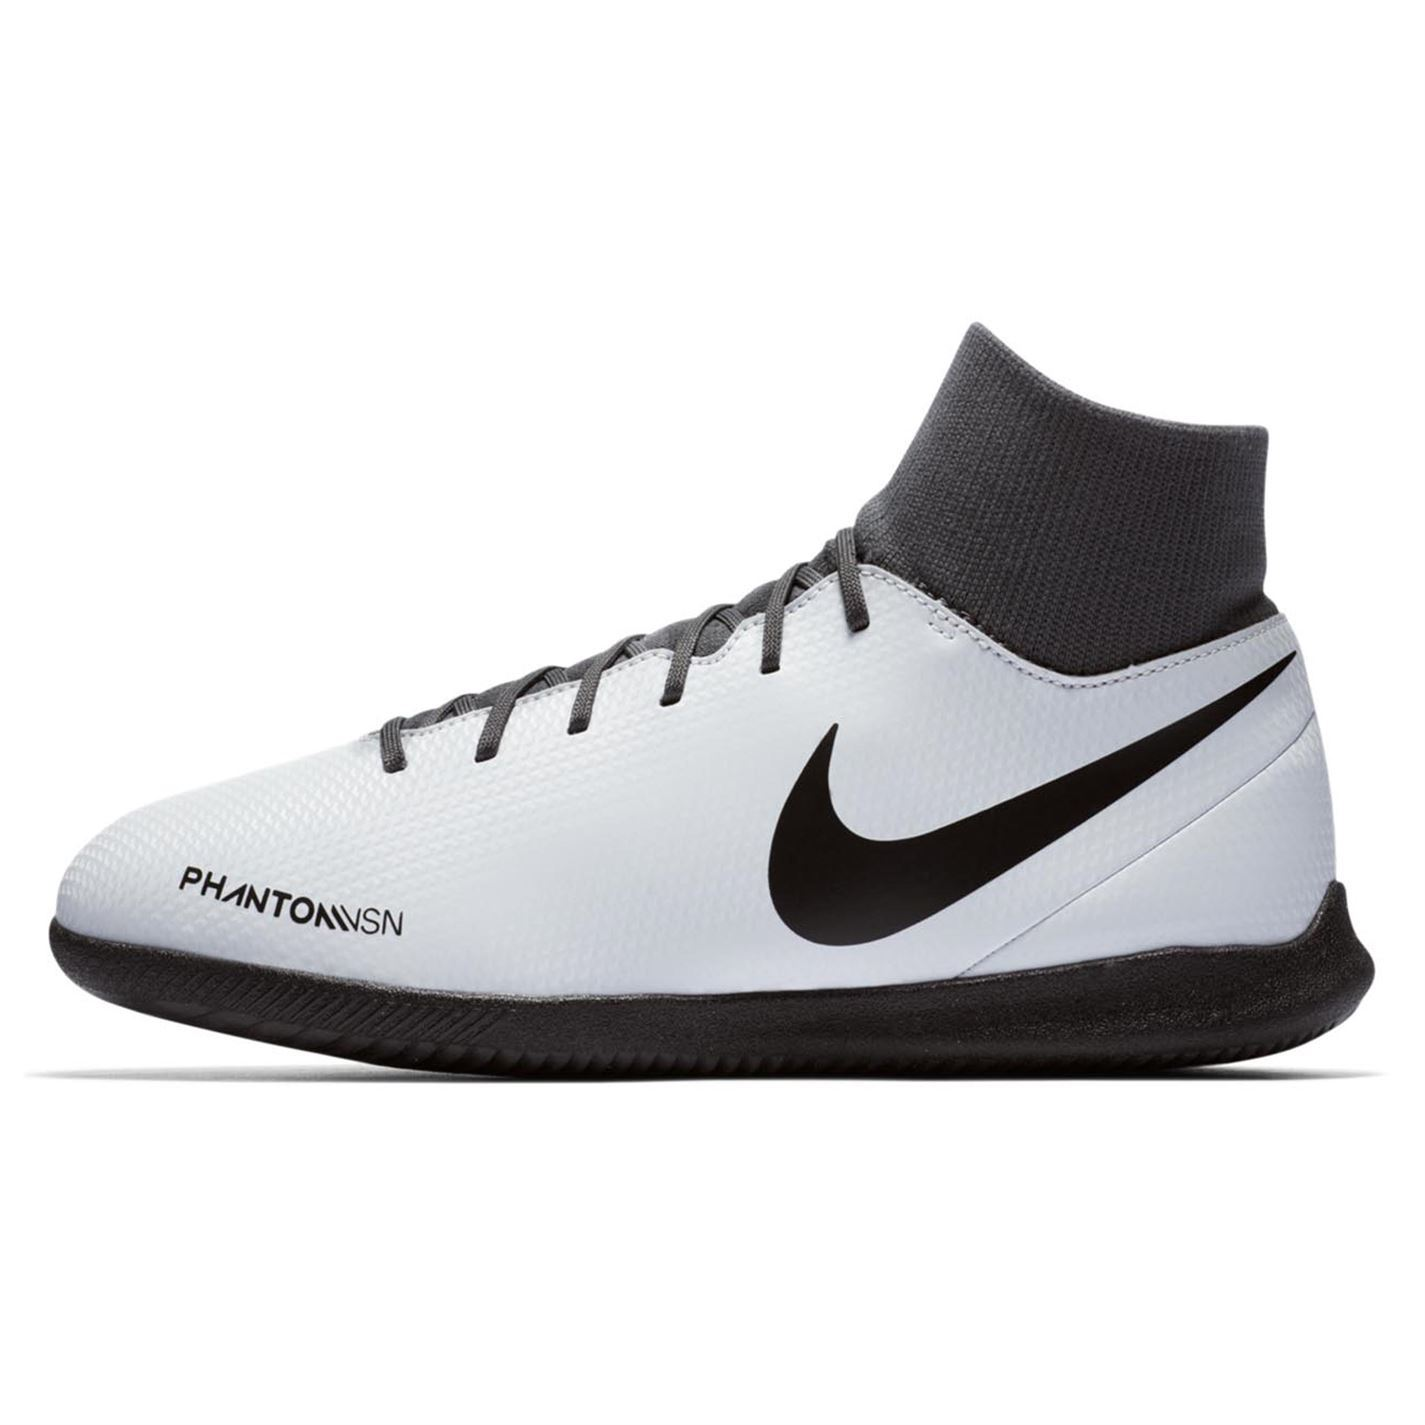 28c3d20114e1a ... Nike Phantom Vision Club DF Indoor Football Trainers Mens Soccer Futsal  Shoes